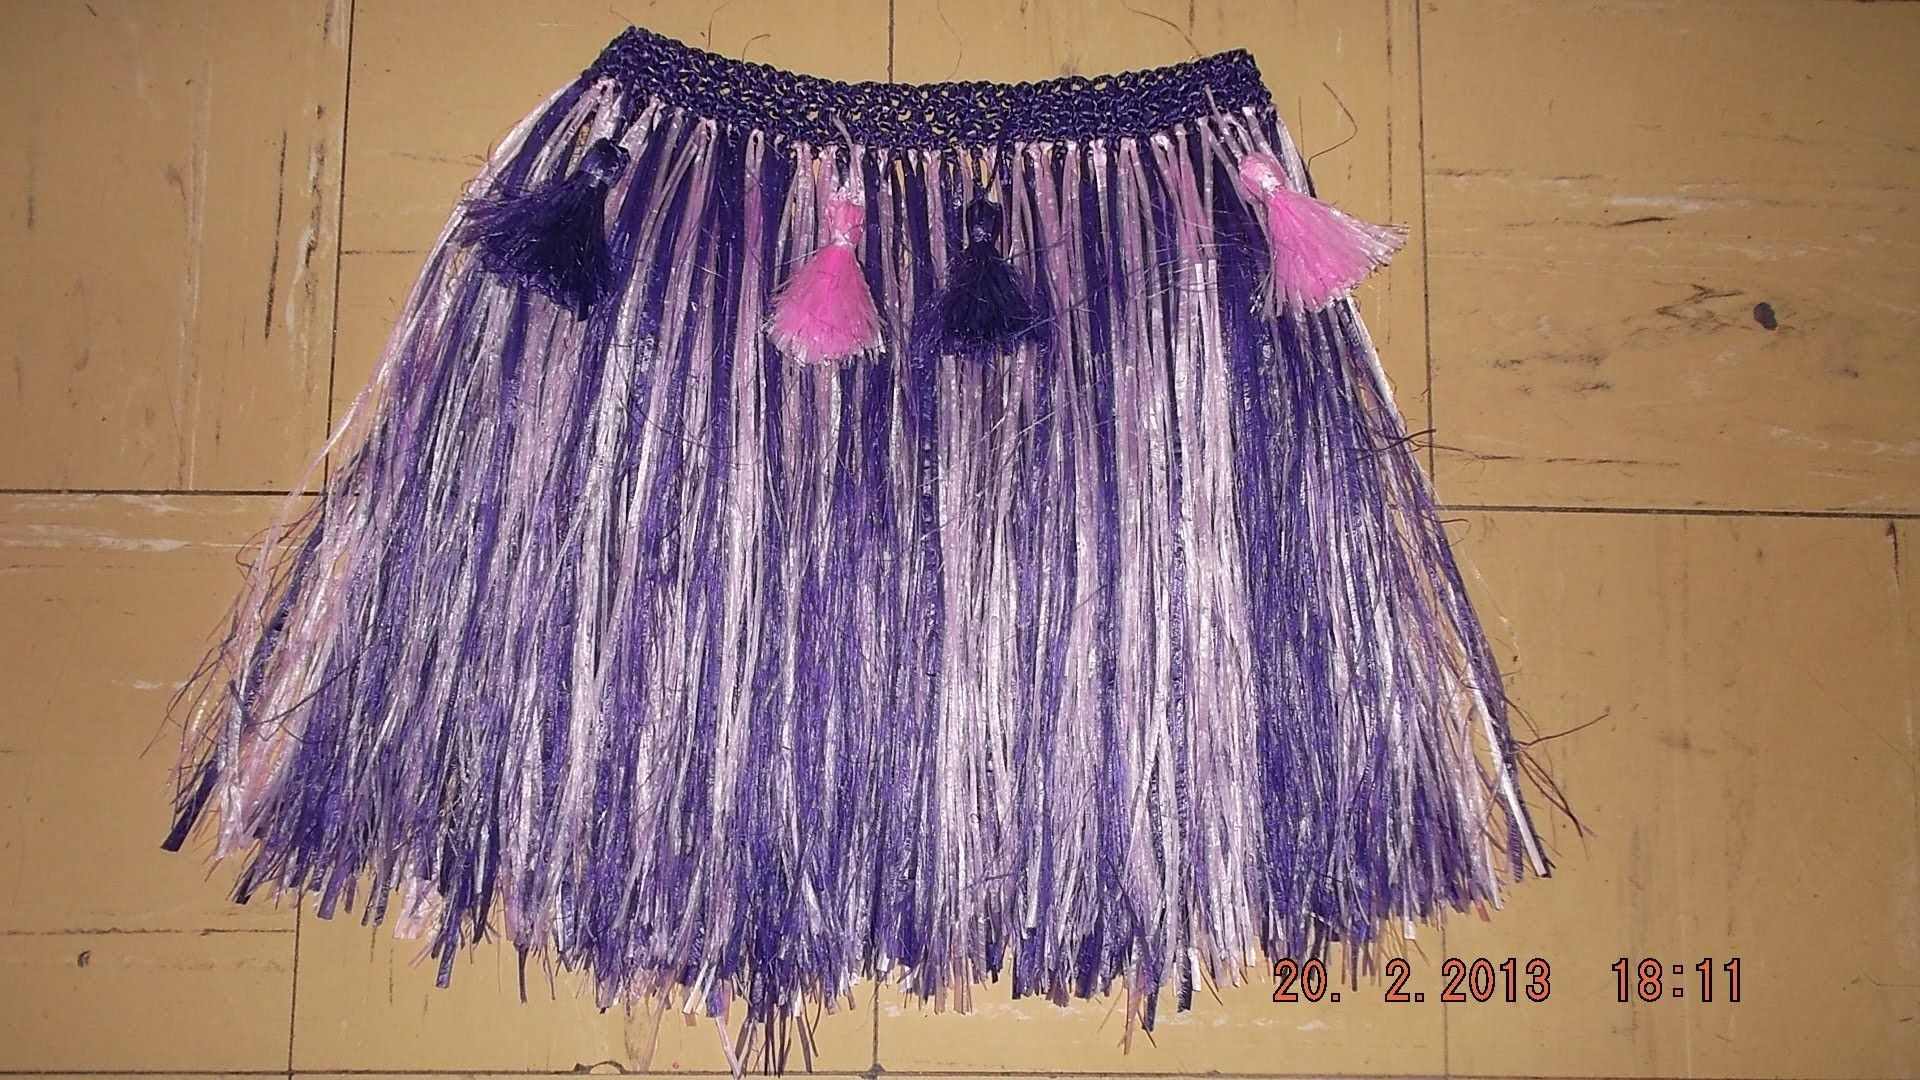 como hacer una falda hawaiana | Projects to Try | Pinterest | Falda ...